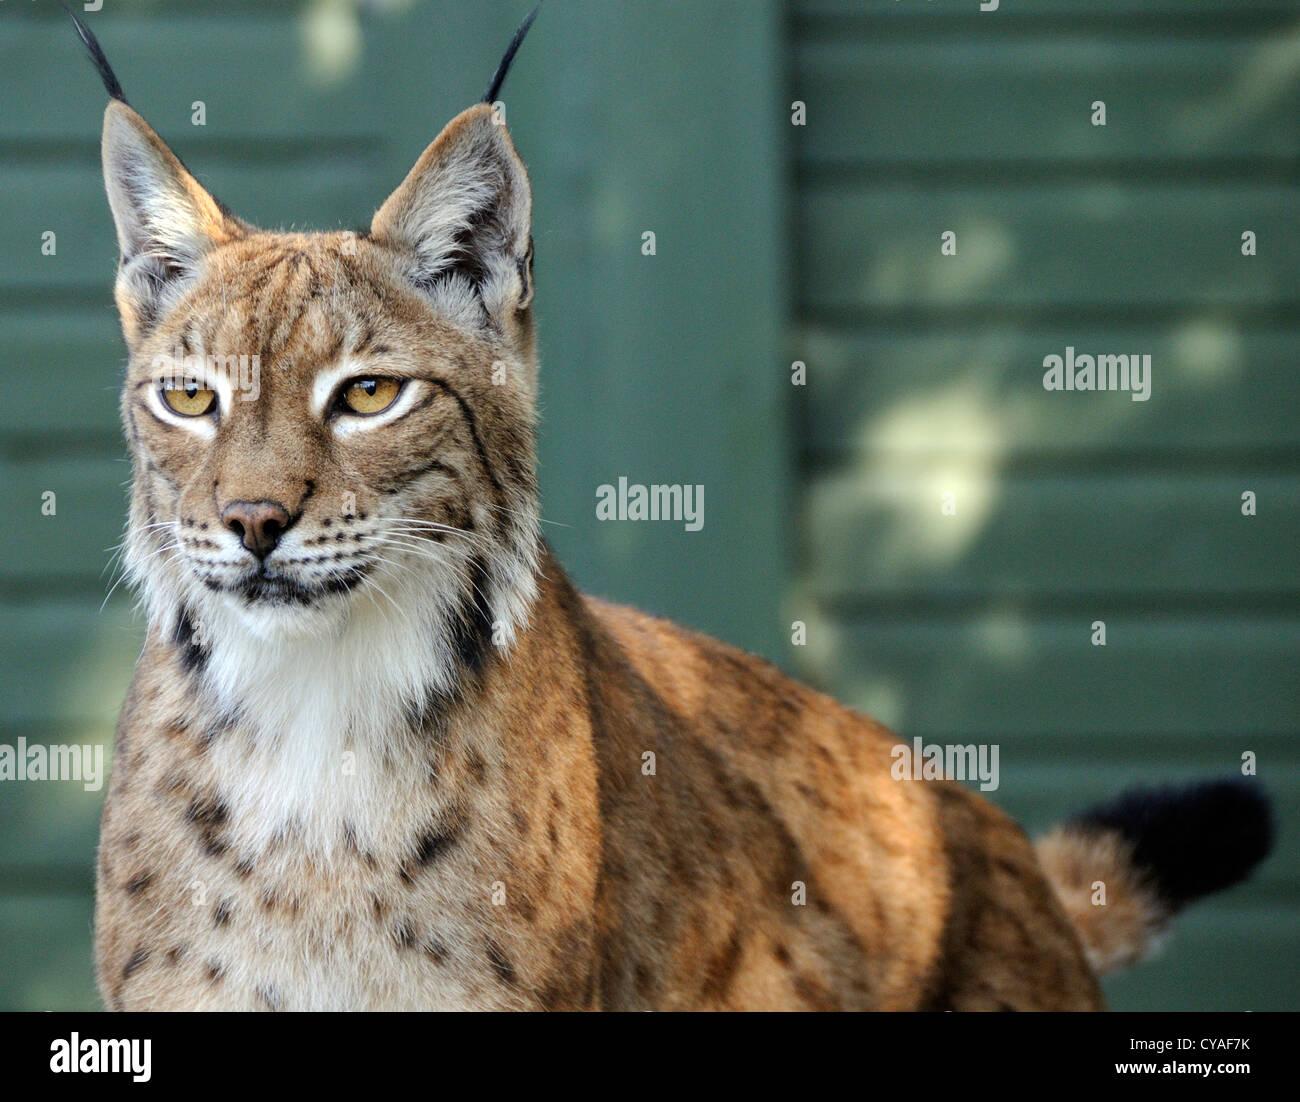 European Lynx (Felis lynx) in a cage. Captive animal. Wildlife Heritage Foundation, Smarden, Kent. - Stock Image